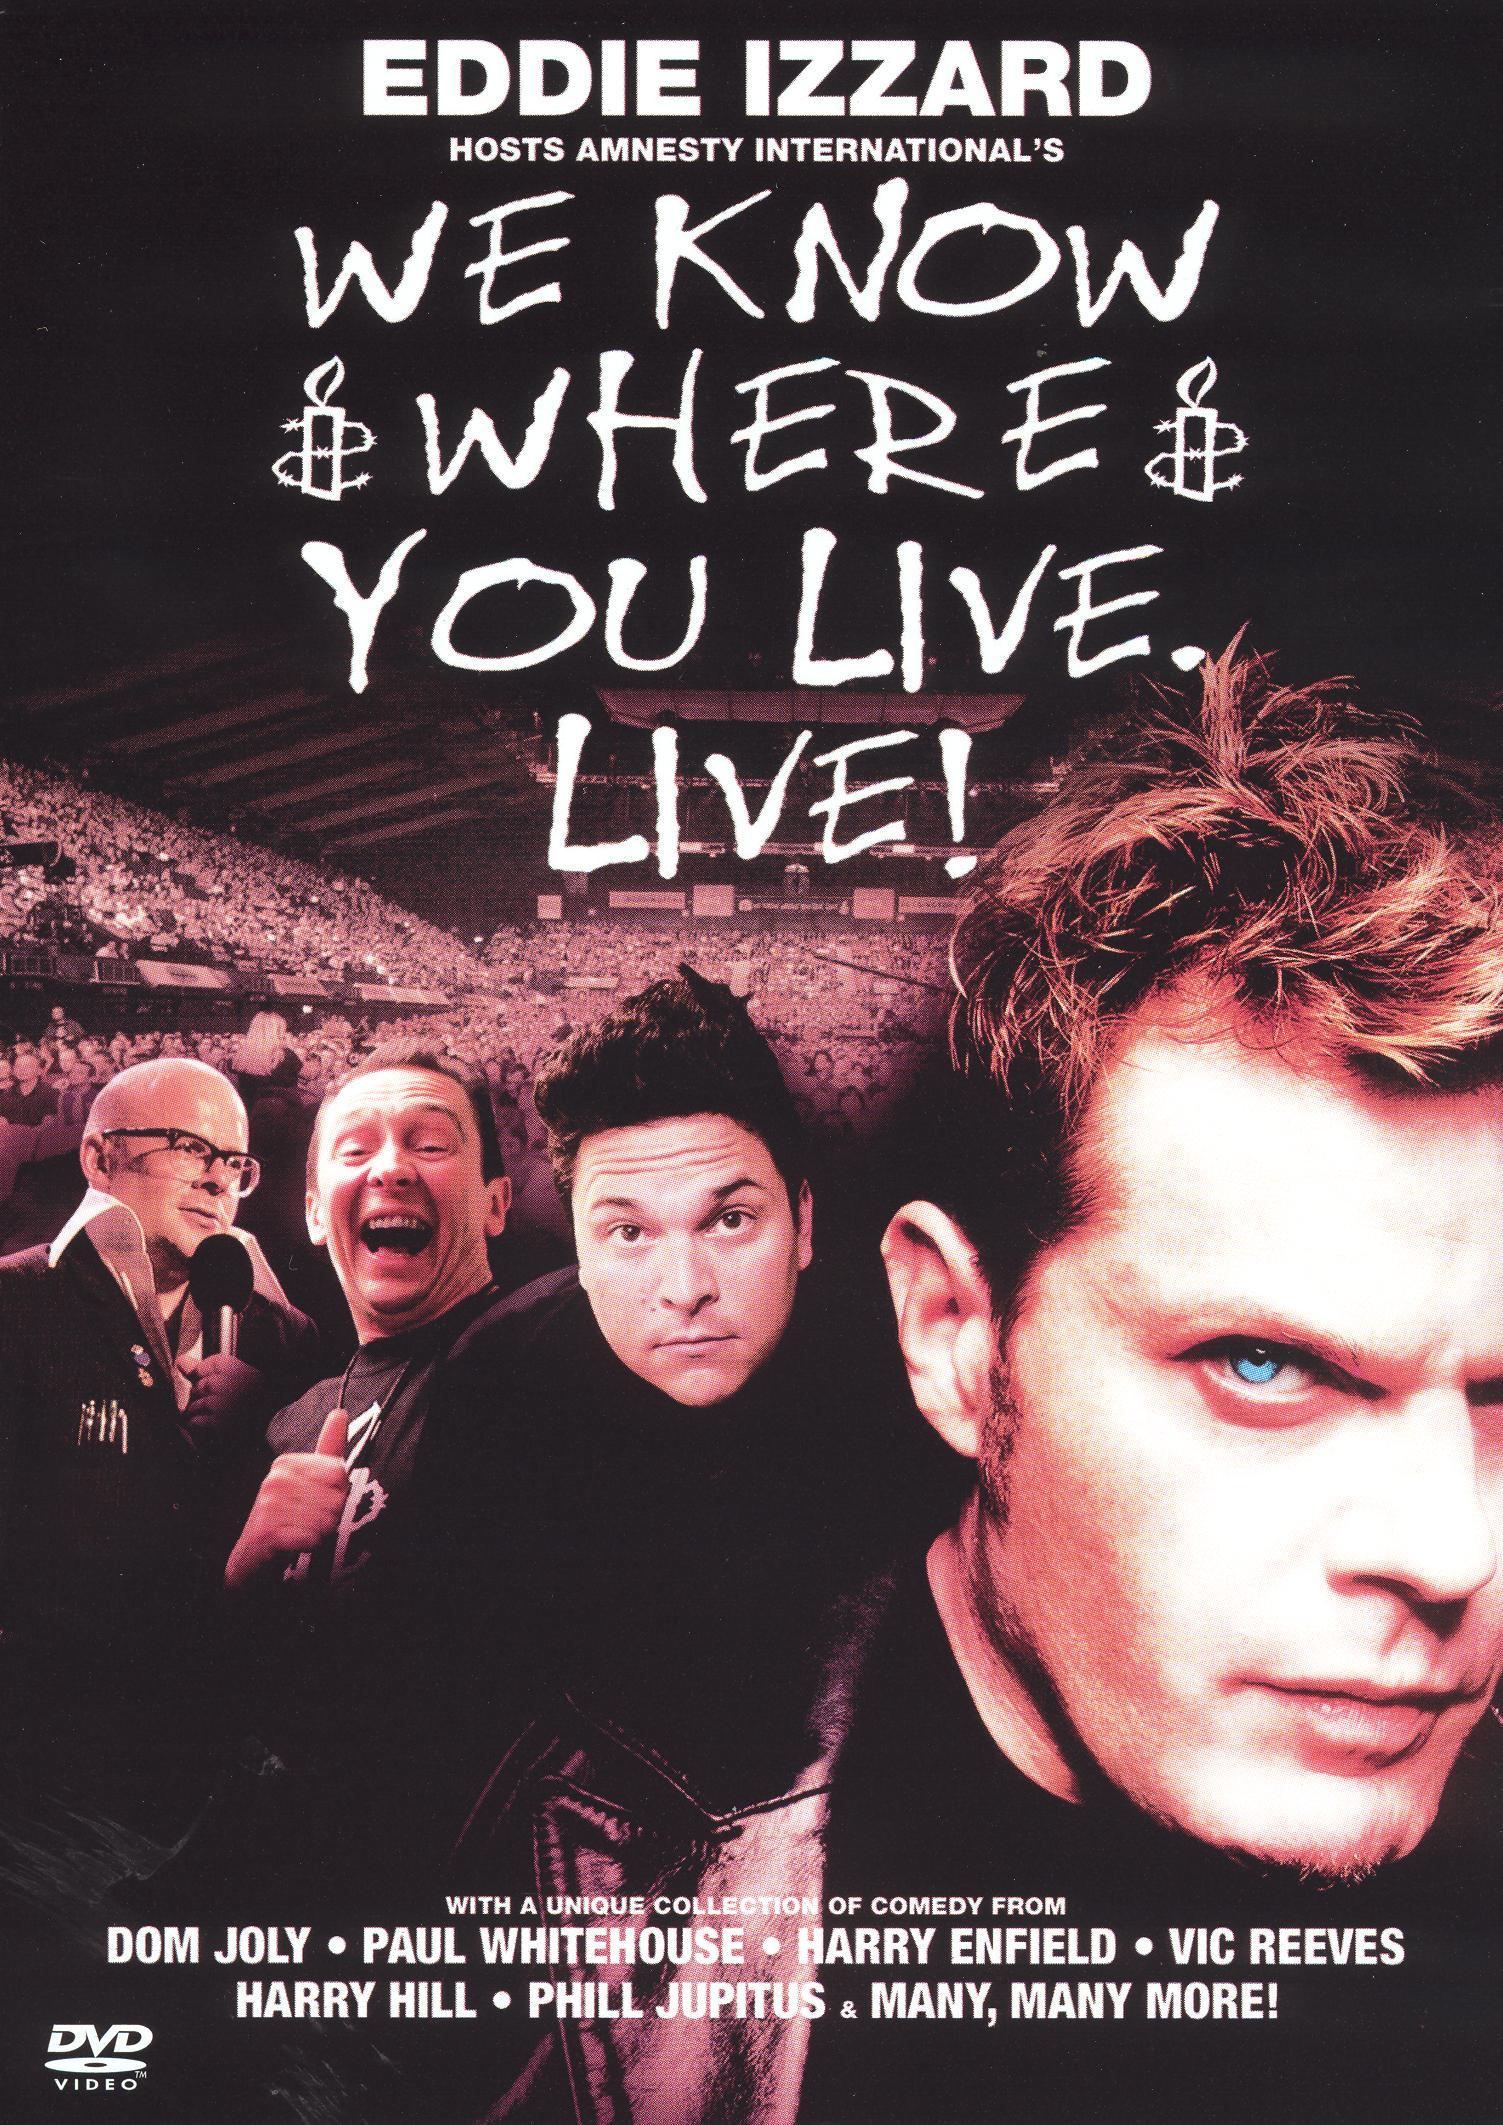 We Know Where You Live. Live!